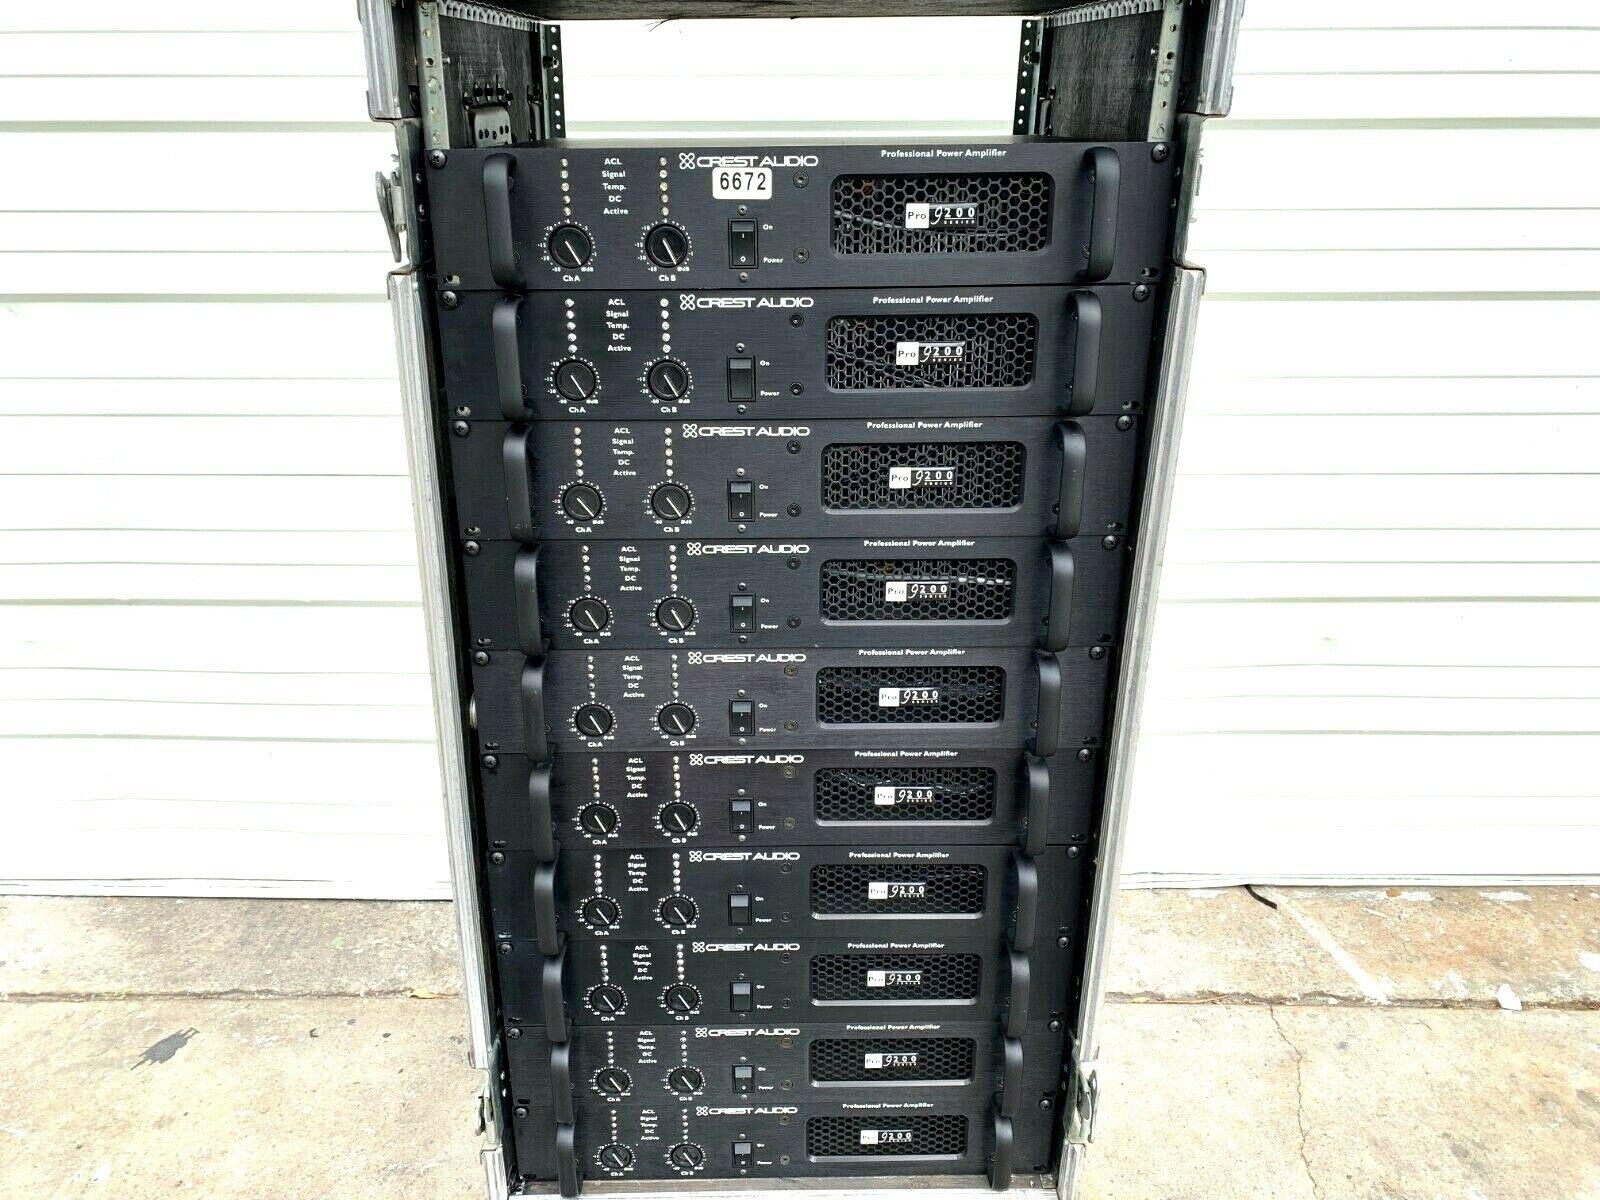 CREST AUDIO PRO 9200 PROFESSIONAL POWER AMPLIFIER W POWER CORD  6672 (ONE)